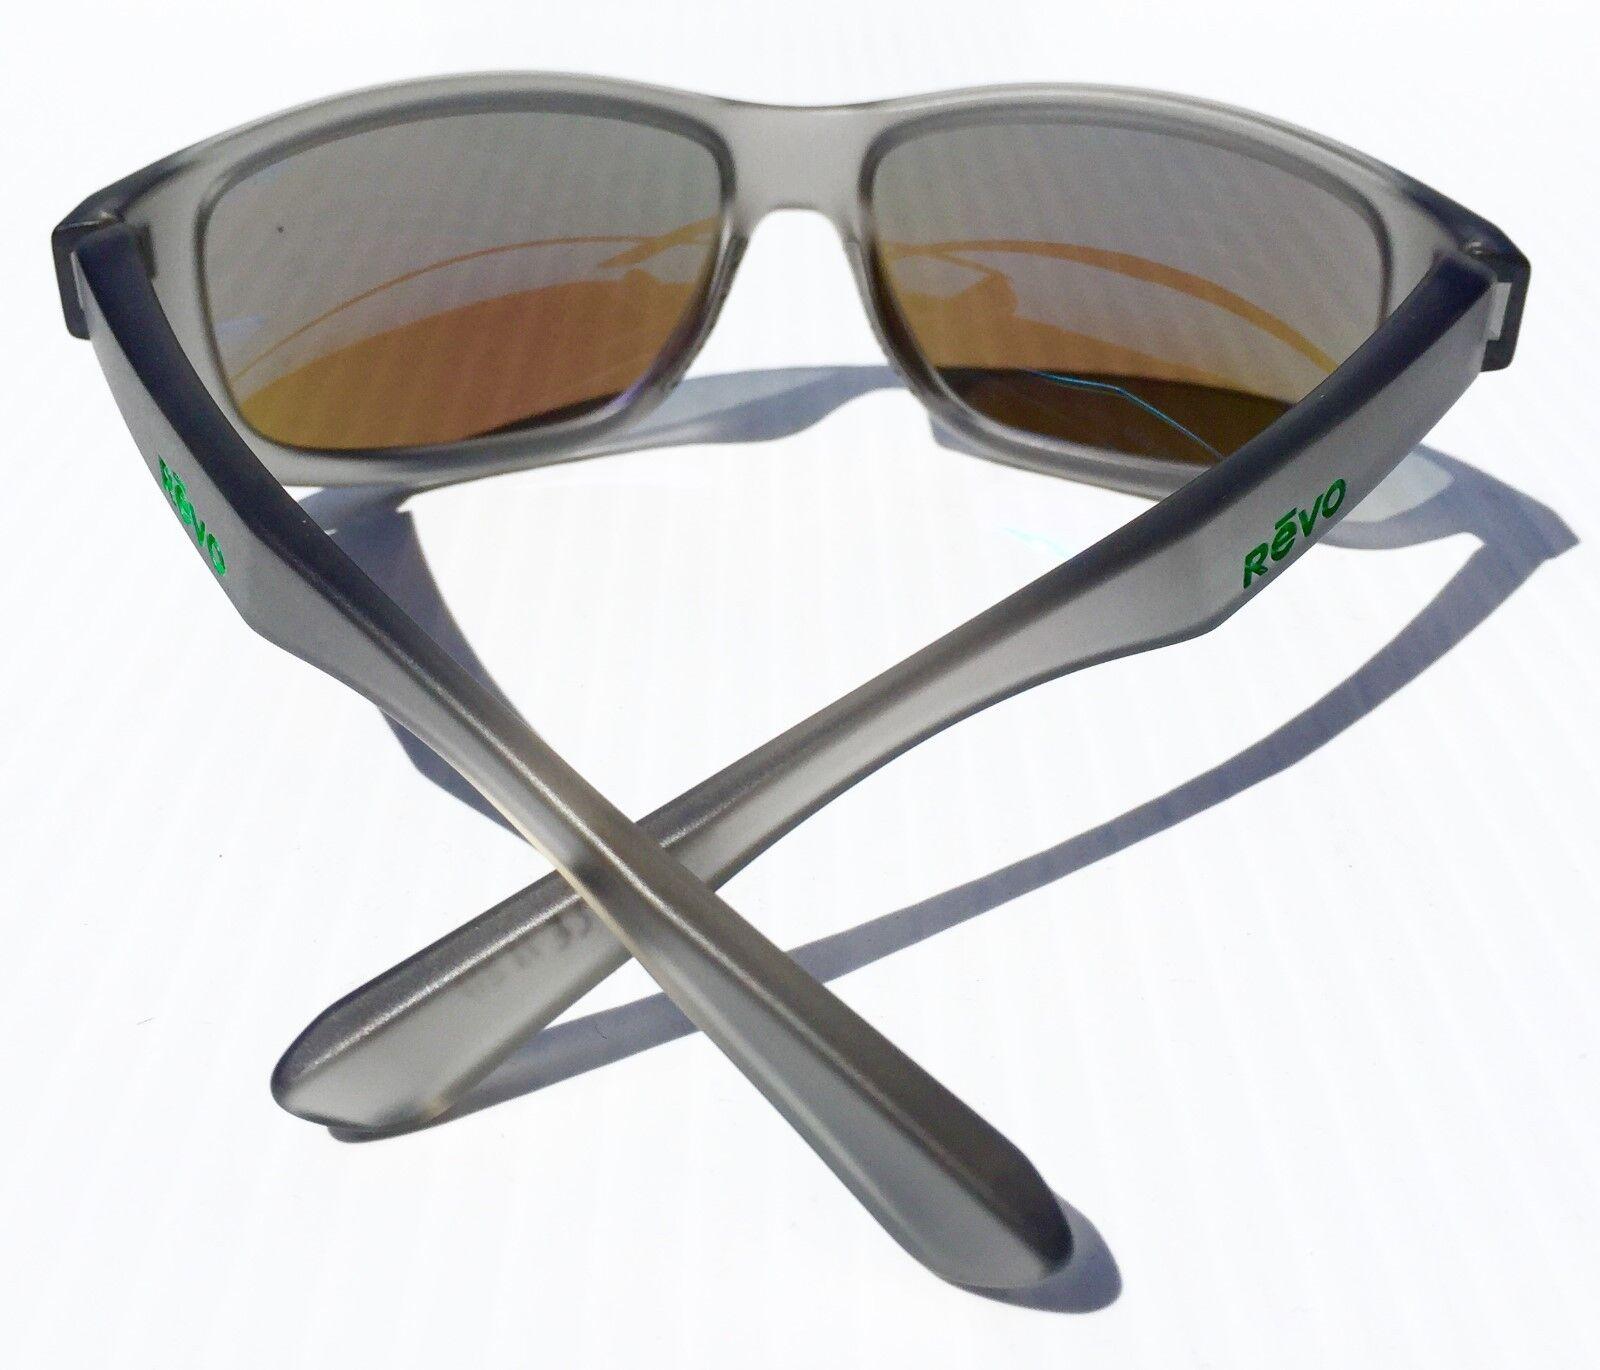 bd9f5b2ff5a58 New  REVO Baseliner Matte Grey Polarized Blue Water Angler Lens Sunglass  1006 00 for sale online